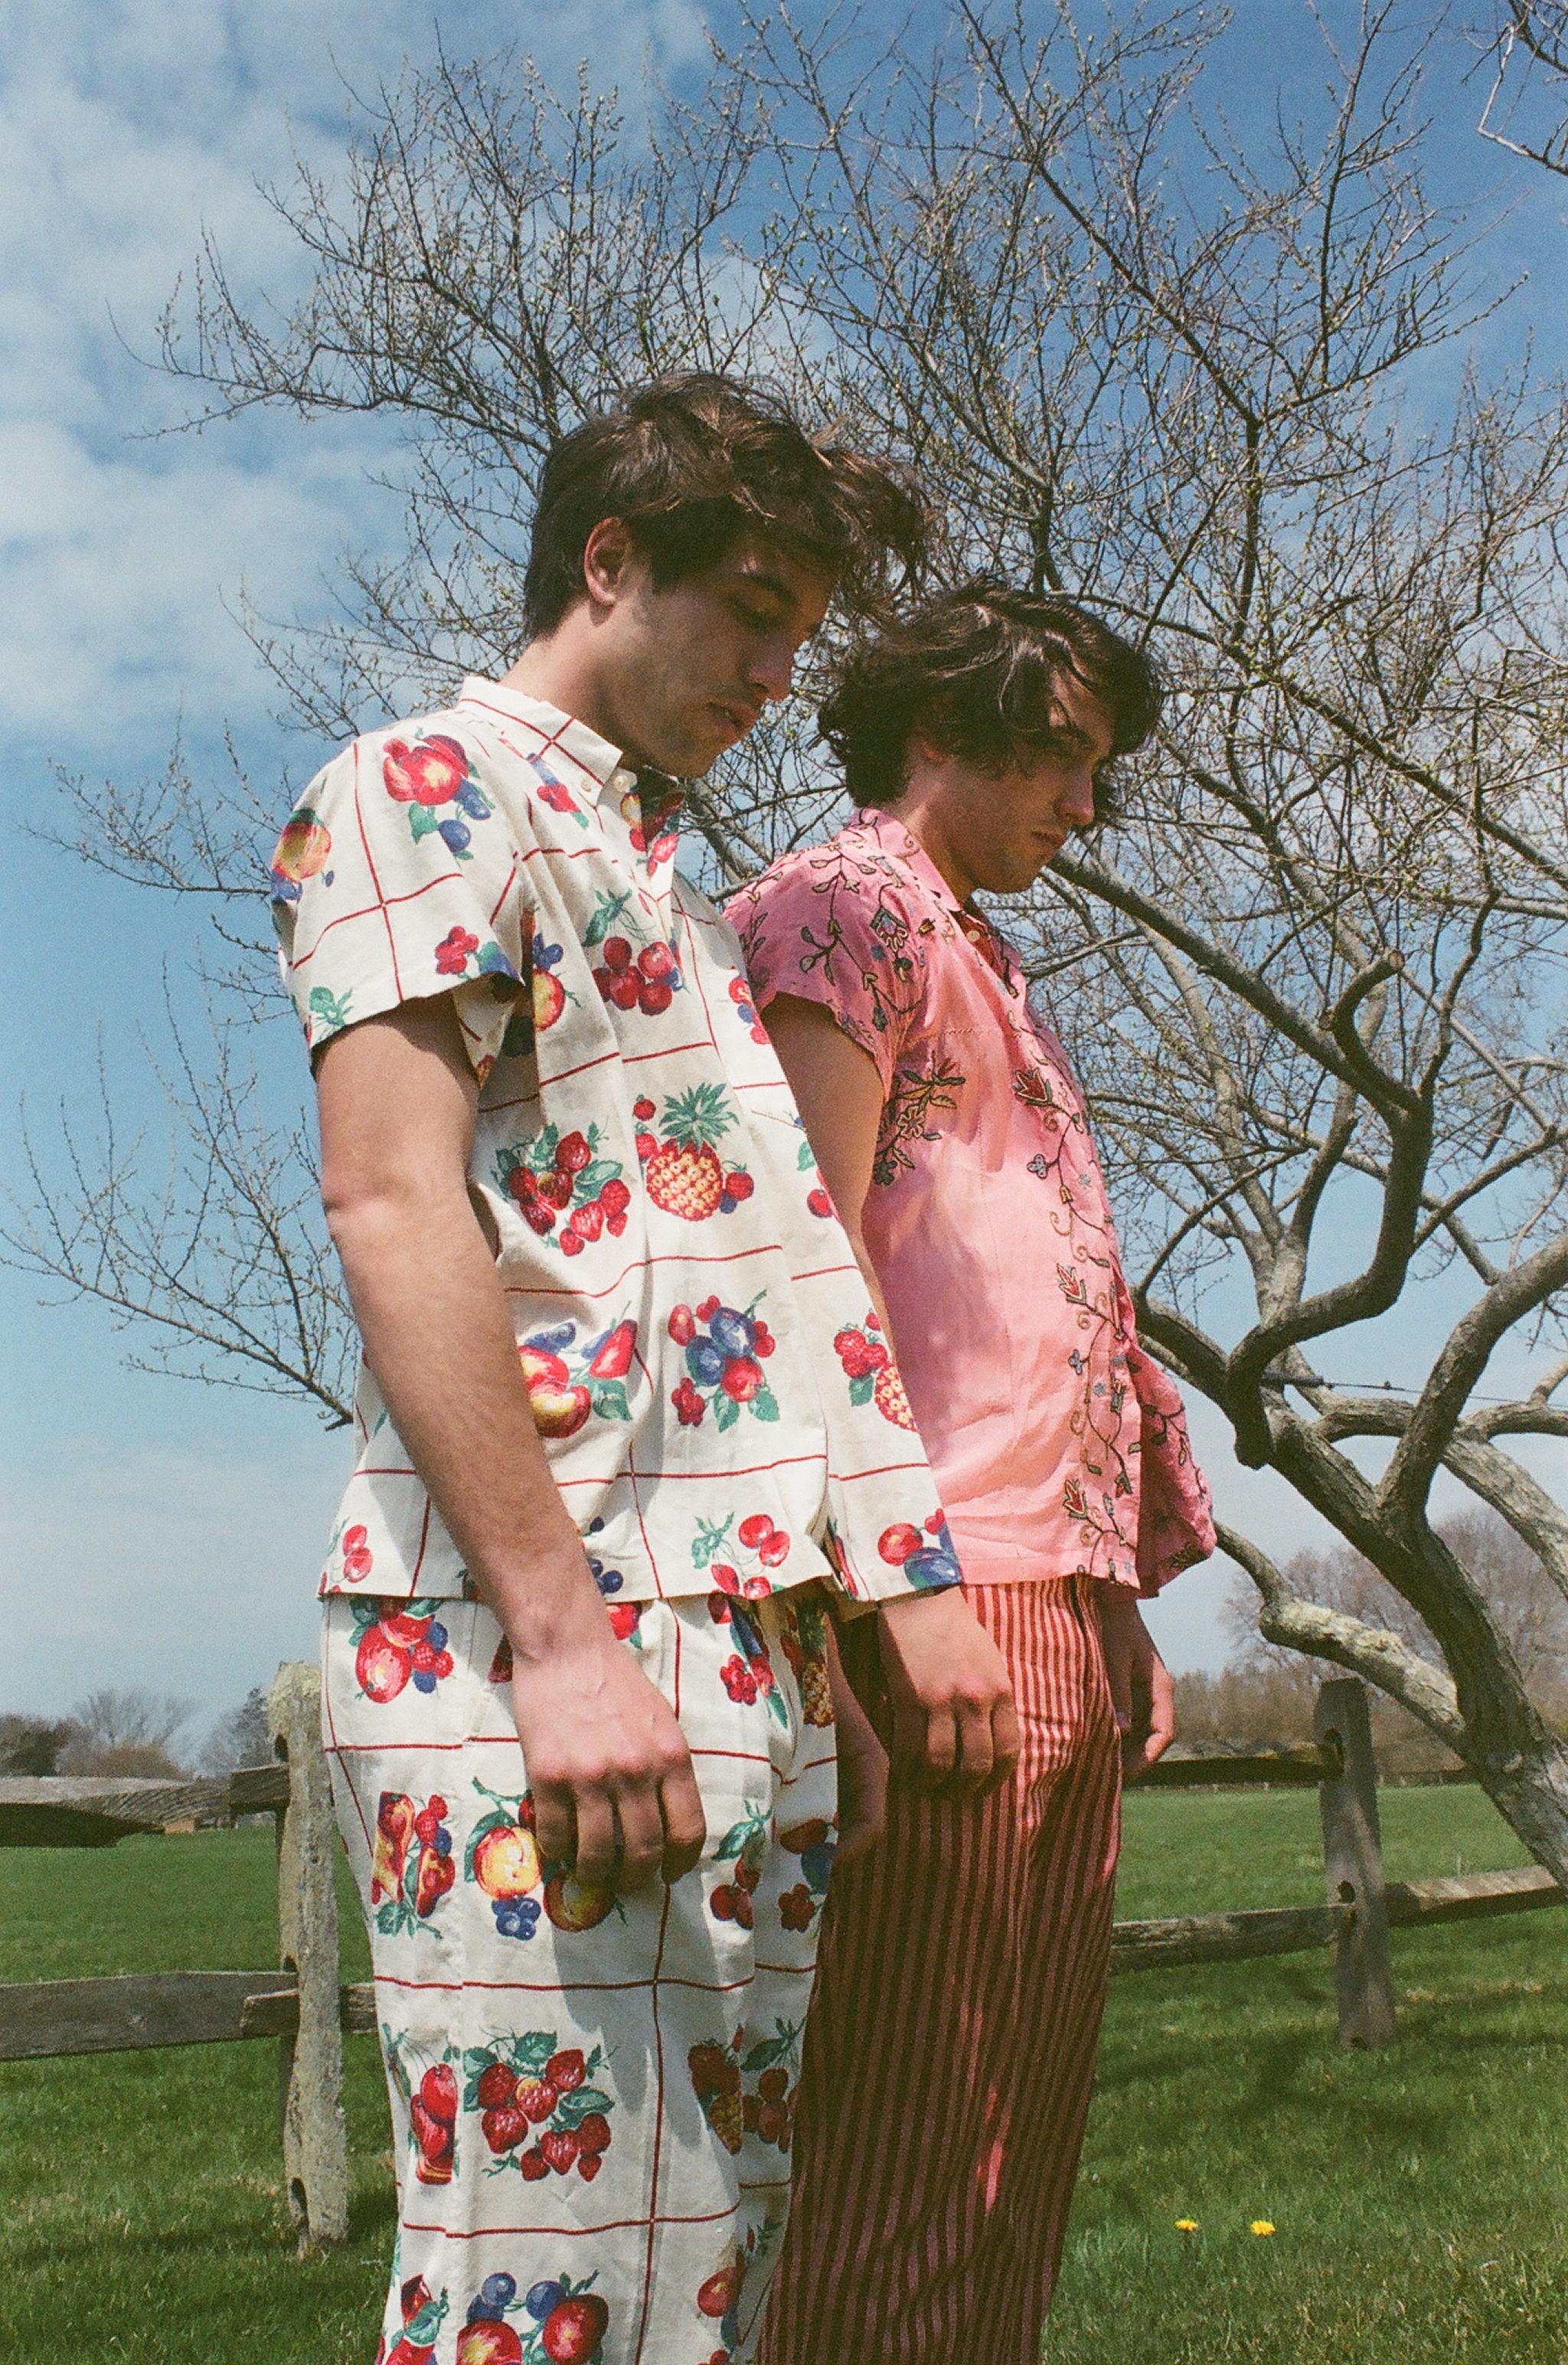 Chelsy-Mitchel-photographer-bode-nyc-fashion-beach-editorial-beachside-car-christian-matthew-rice-fruit-pattern-wardrobe.JPG